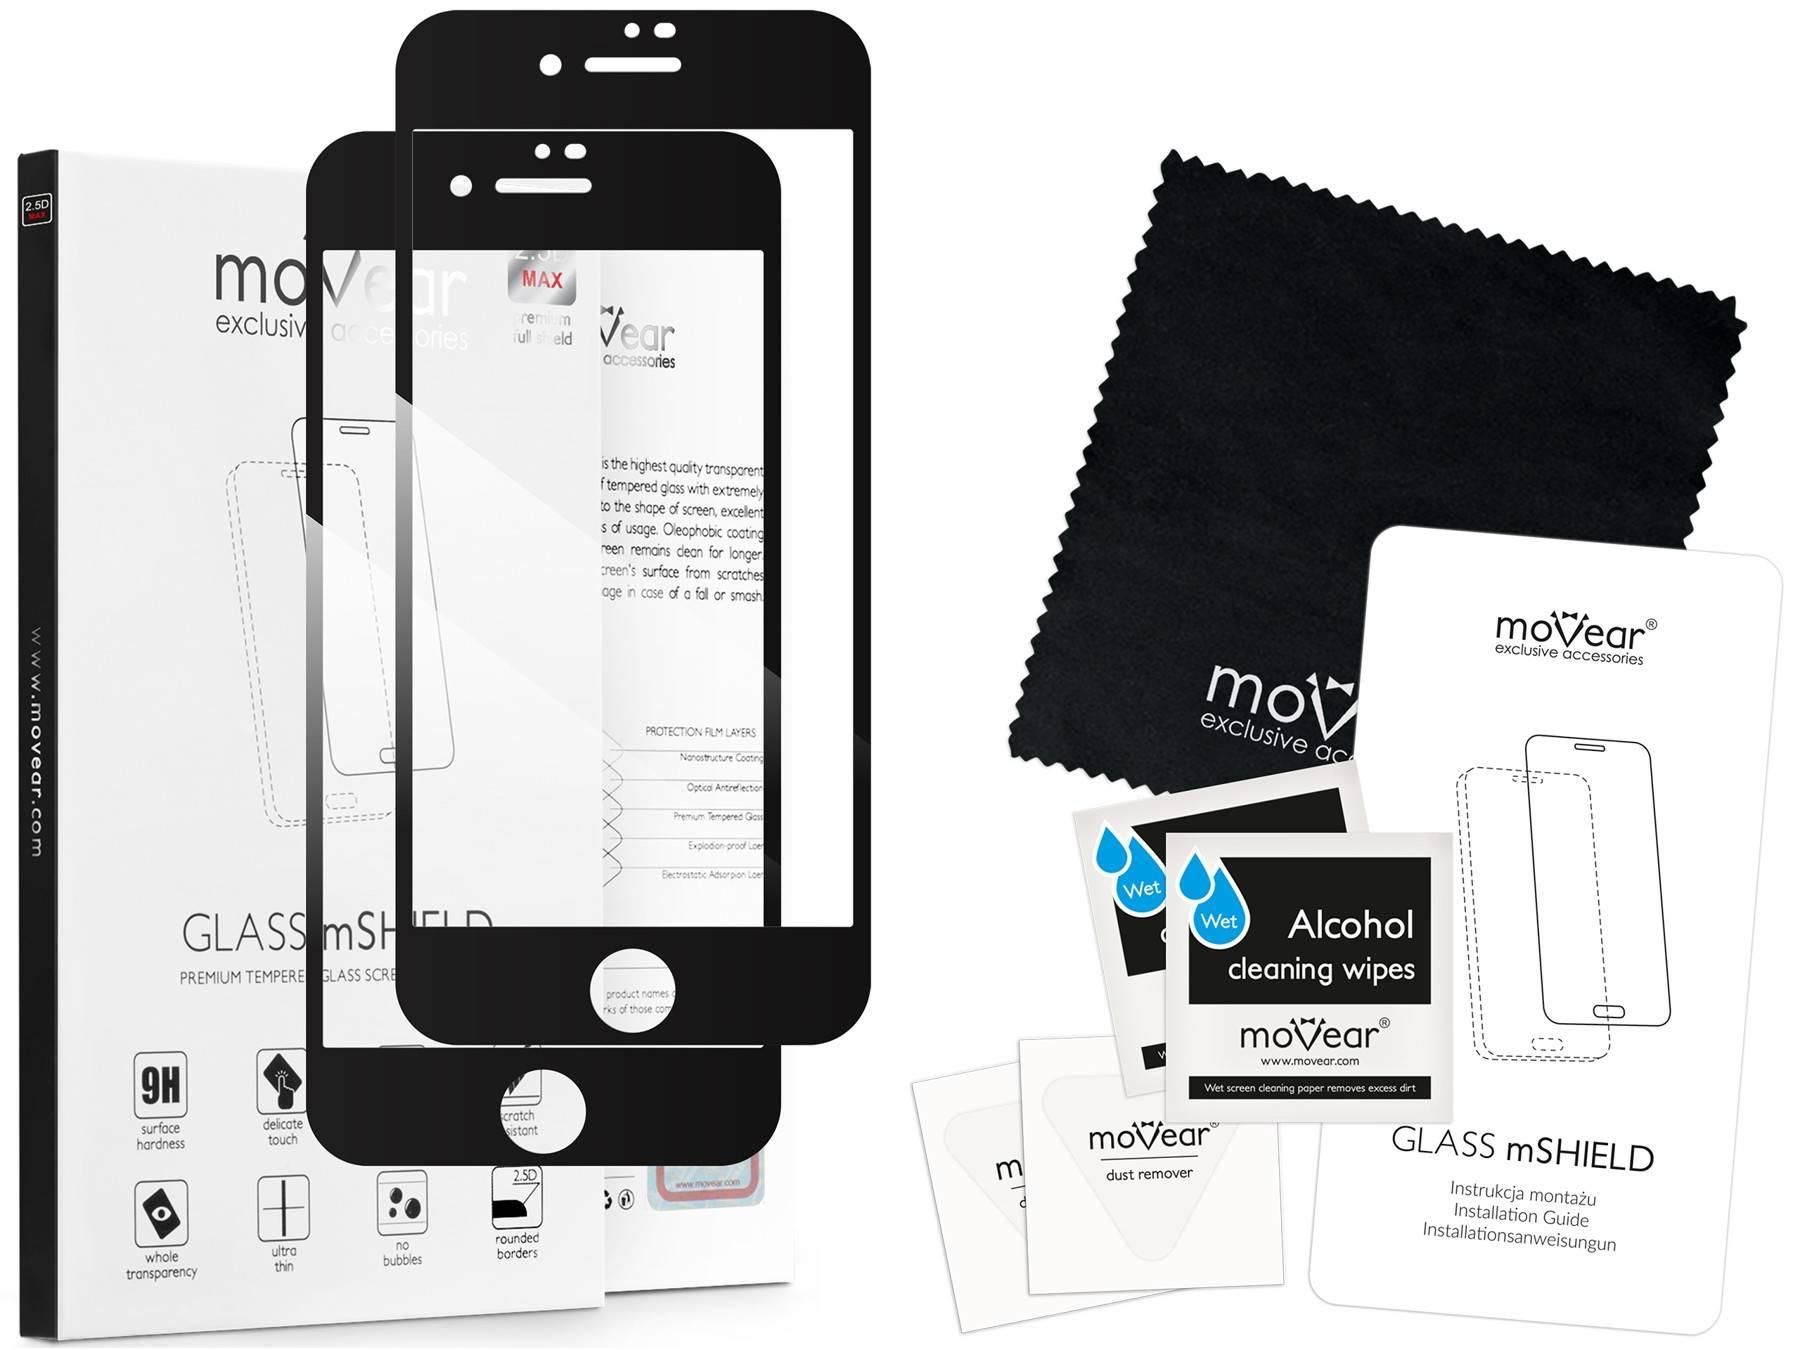 2 szt.   moVear Szkło Hartowane 2.5D MAX na Apple iPhone 8 / 7   do etui, 9H   GLASS mSHIELD Czarny